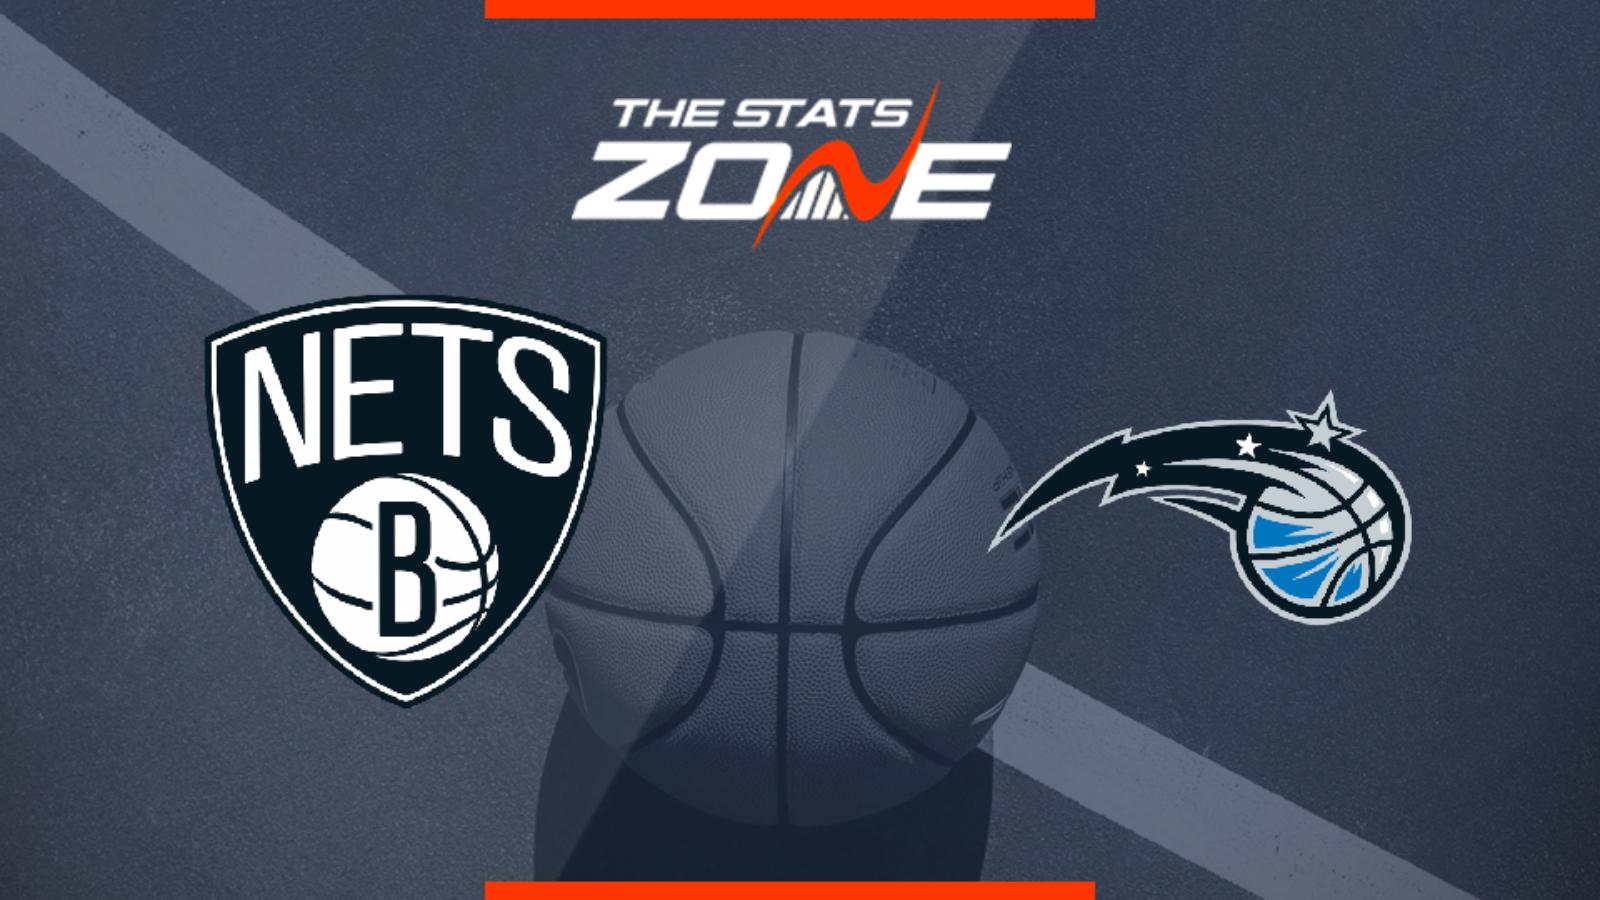 2019 20 Nba Brooklyn Nets Orlando Magic Preview Pick The Stats Zone